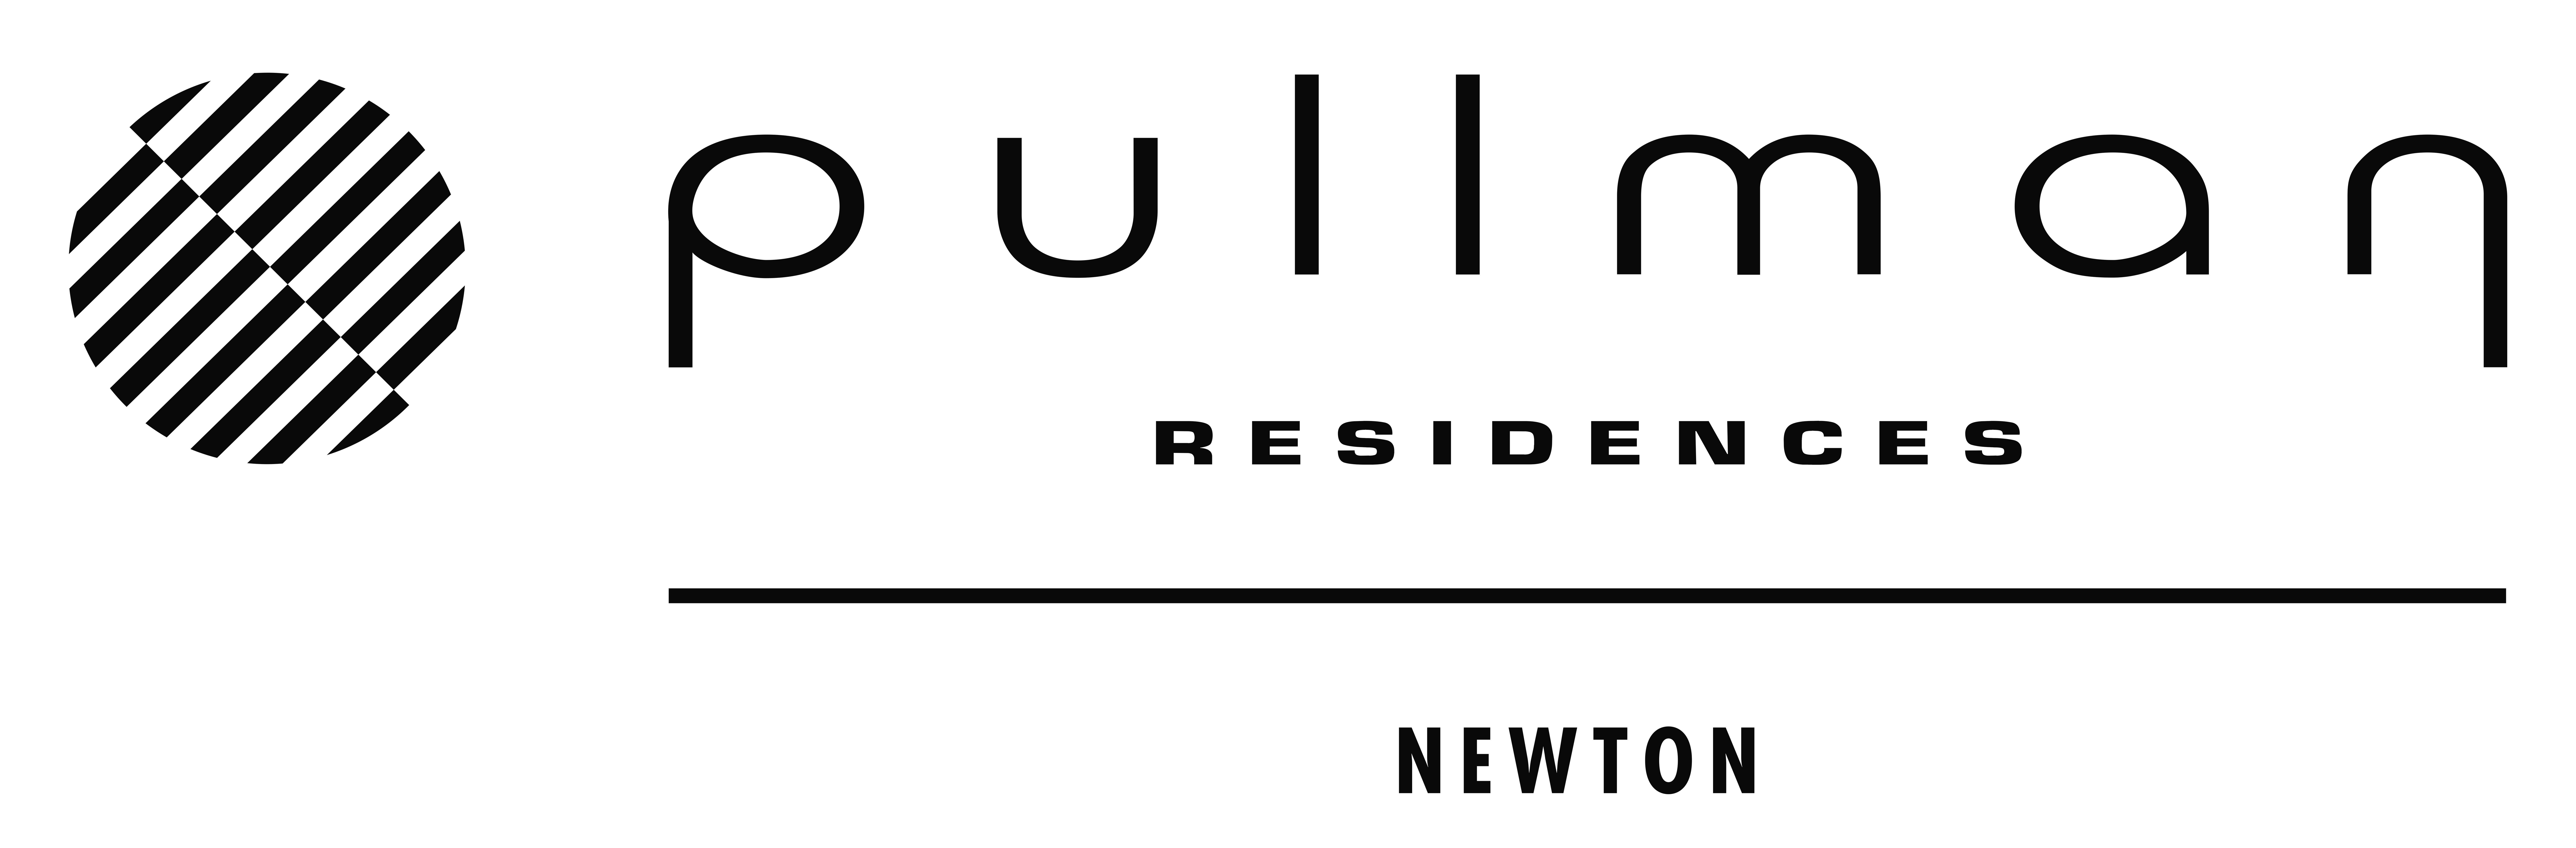 Pullman Residences Logo